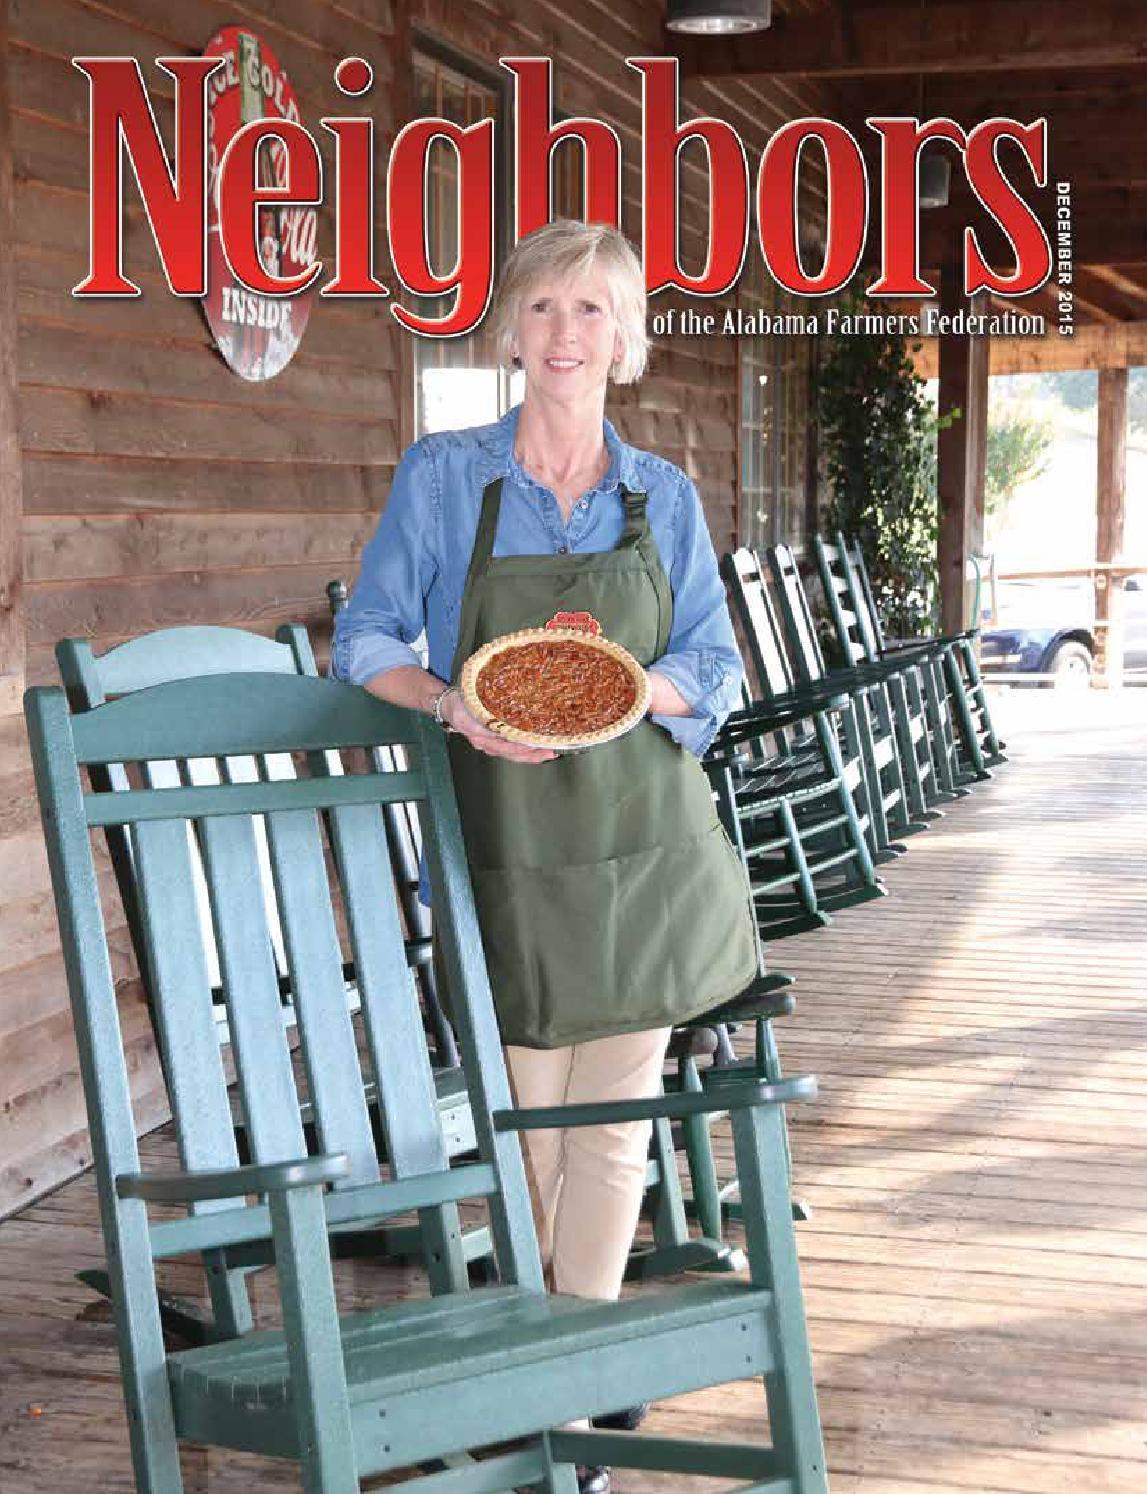 Neighbors Magazine  December 2015 by Alabama Farmers Federation   issuu. Neighbors Magazine  December 2015 by Alabama Farmers Federation